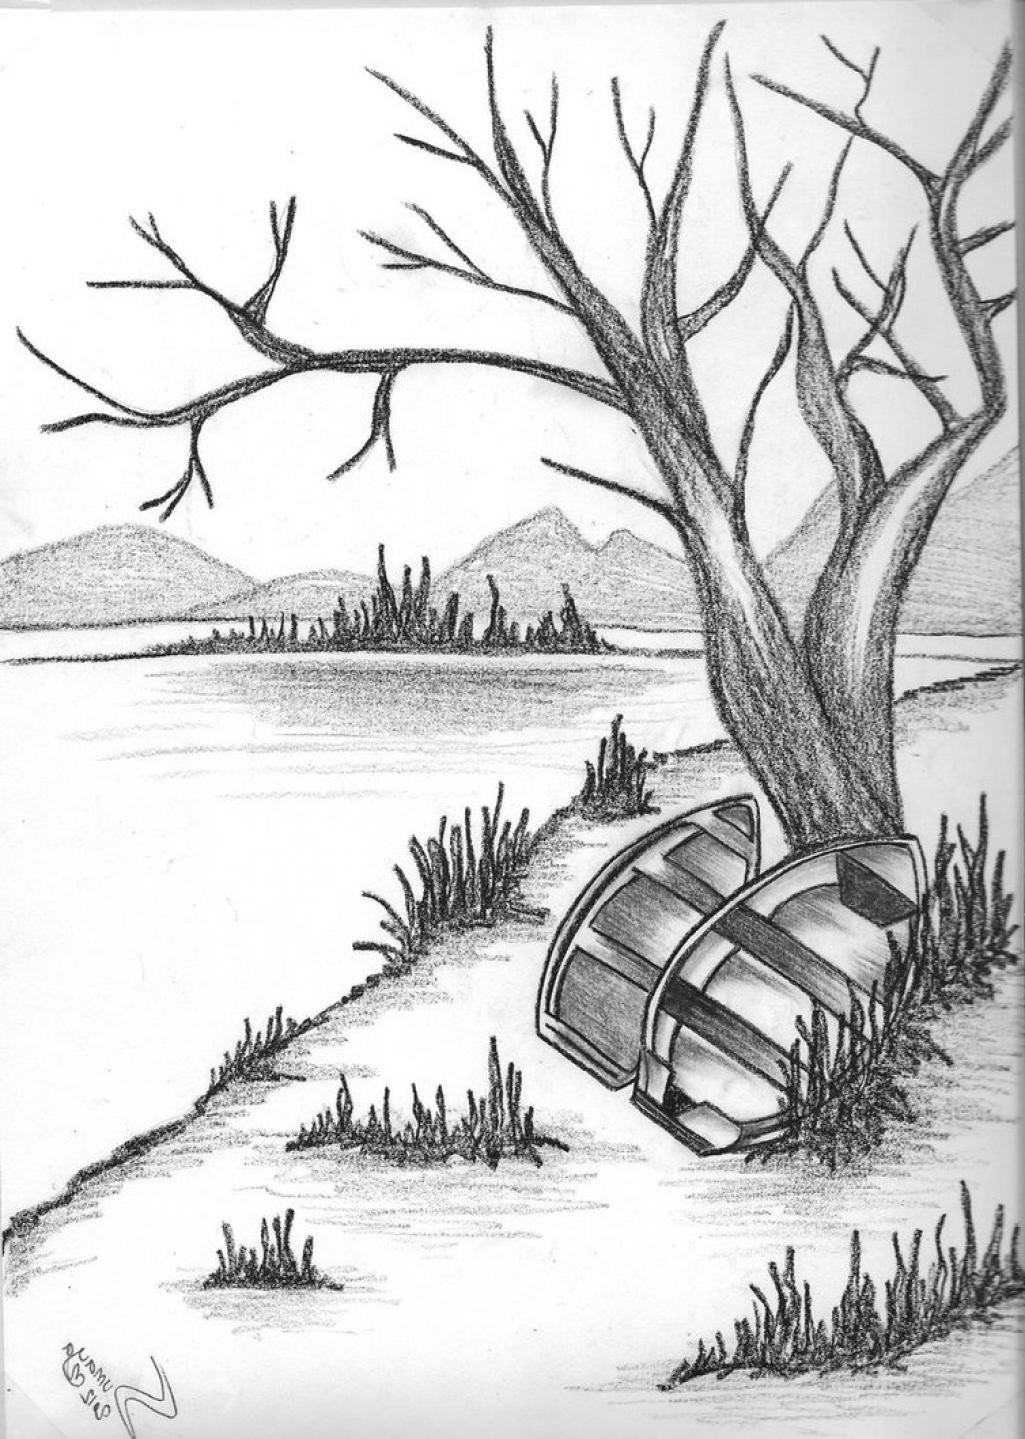 1025x1439 Natural Disaster Sketch Drawing Set Of Doodle Sketch Natural